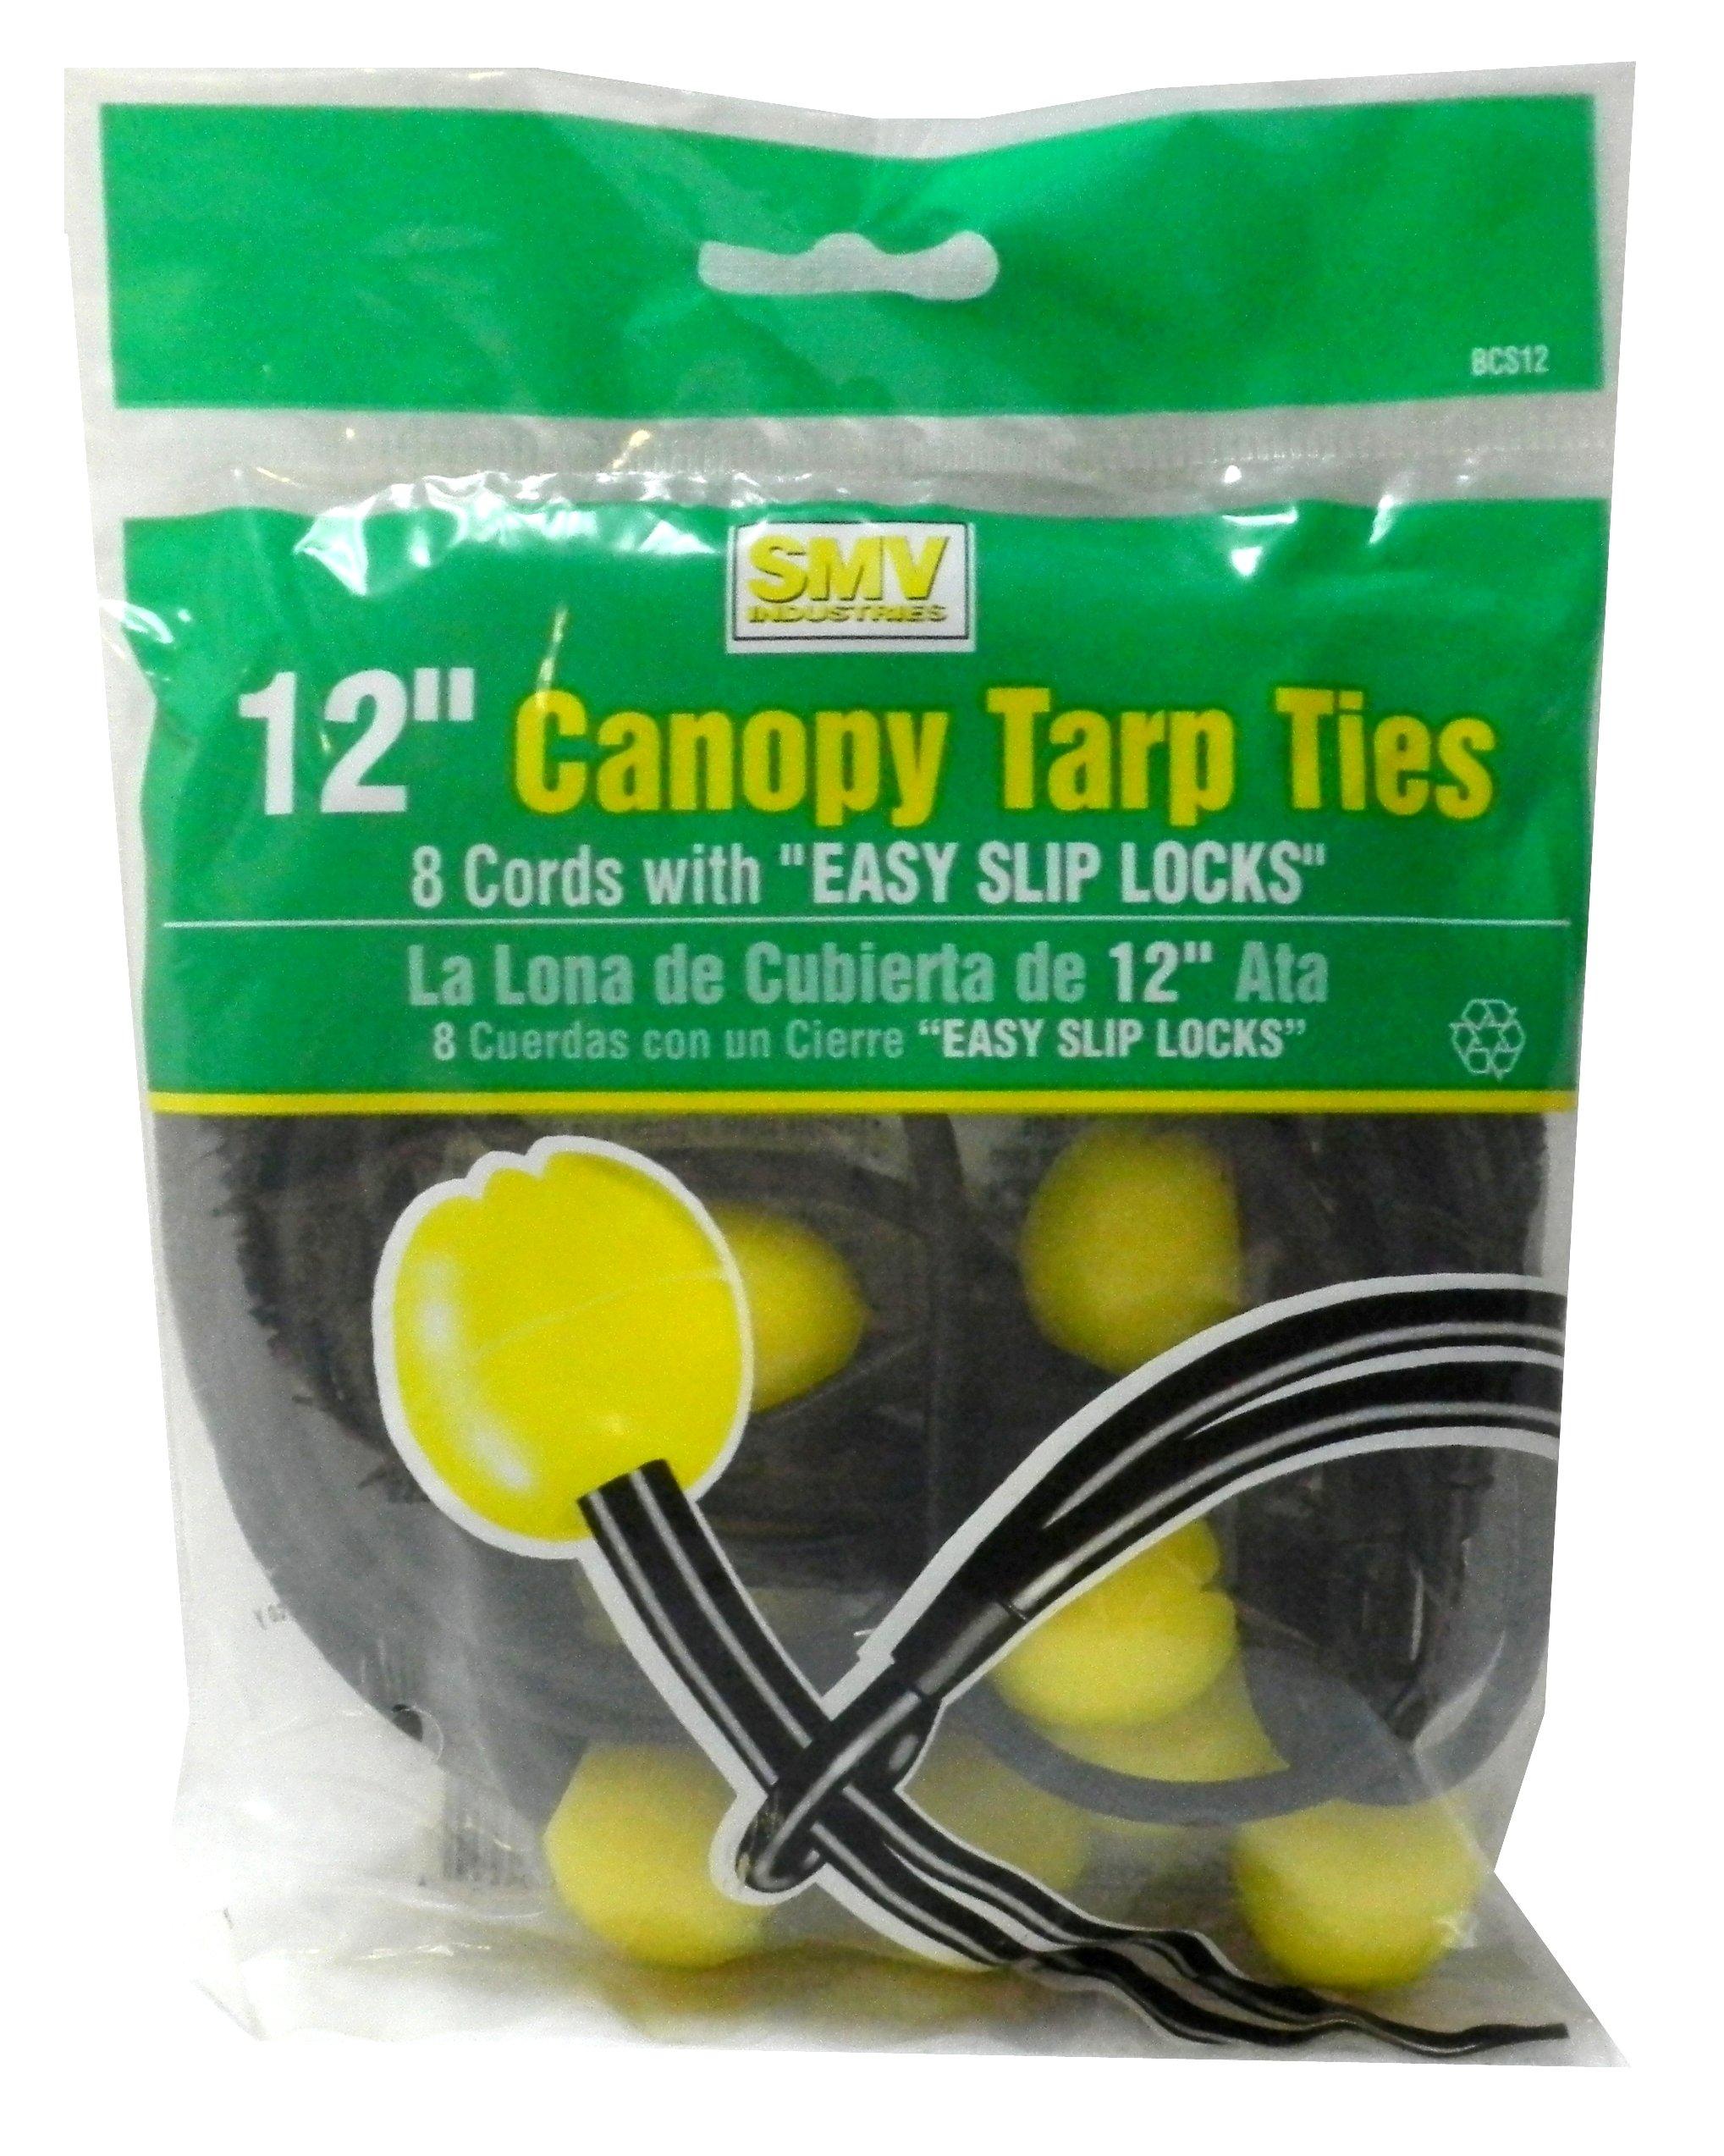 12'' Canopy Tarp Ties